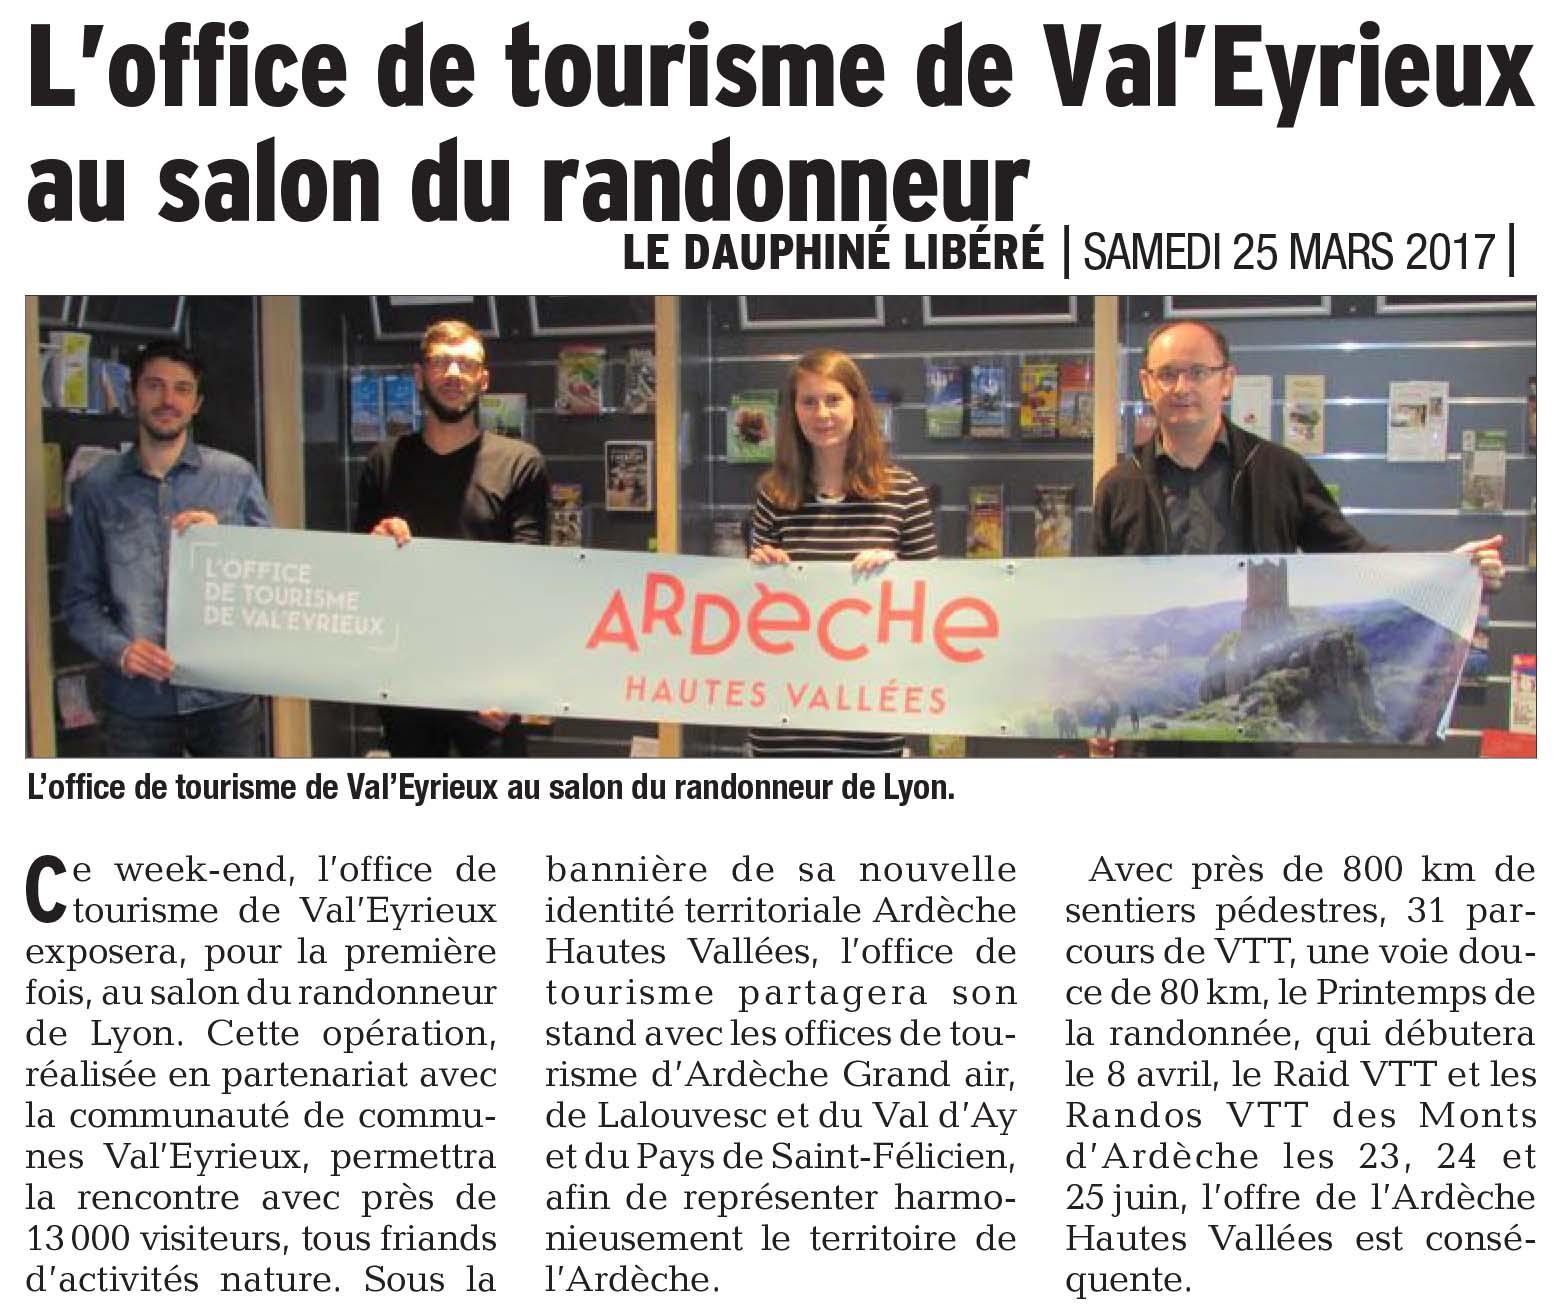 Salon des randonneurs lyon mars 2017 for Salon du randonneur lyon